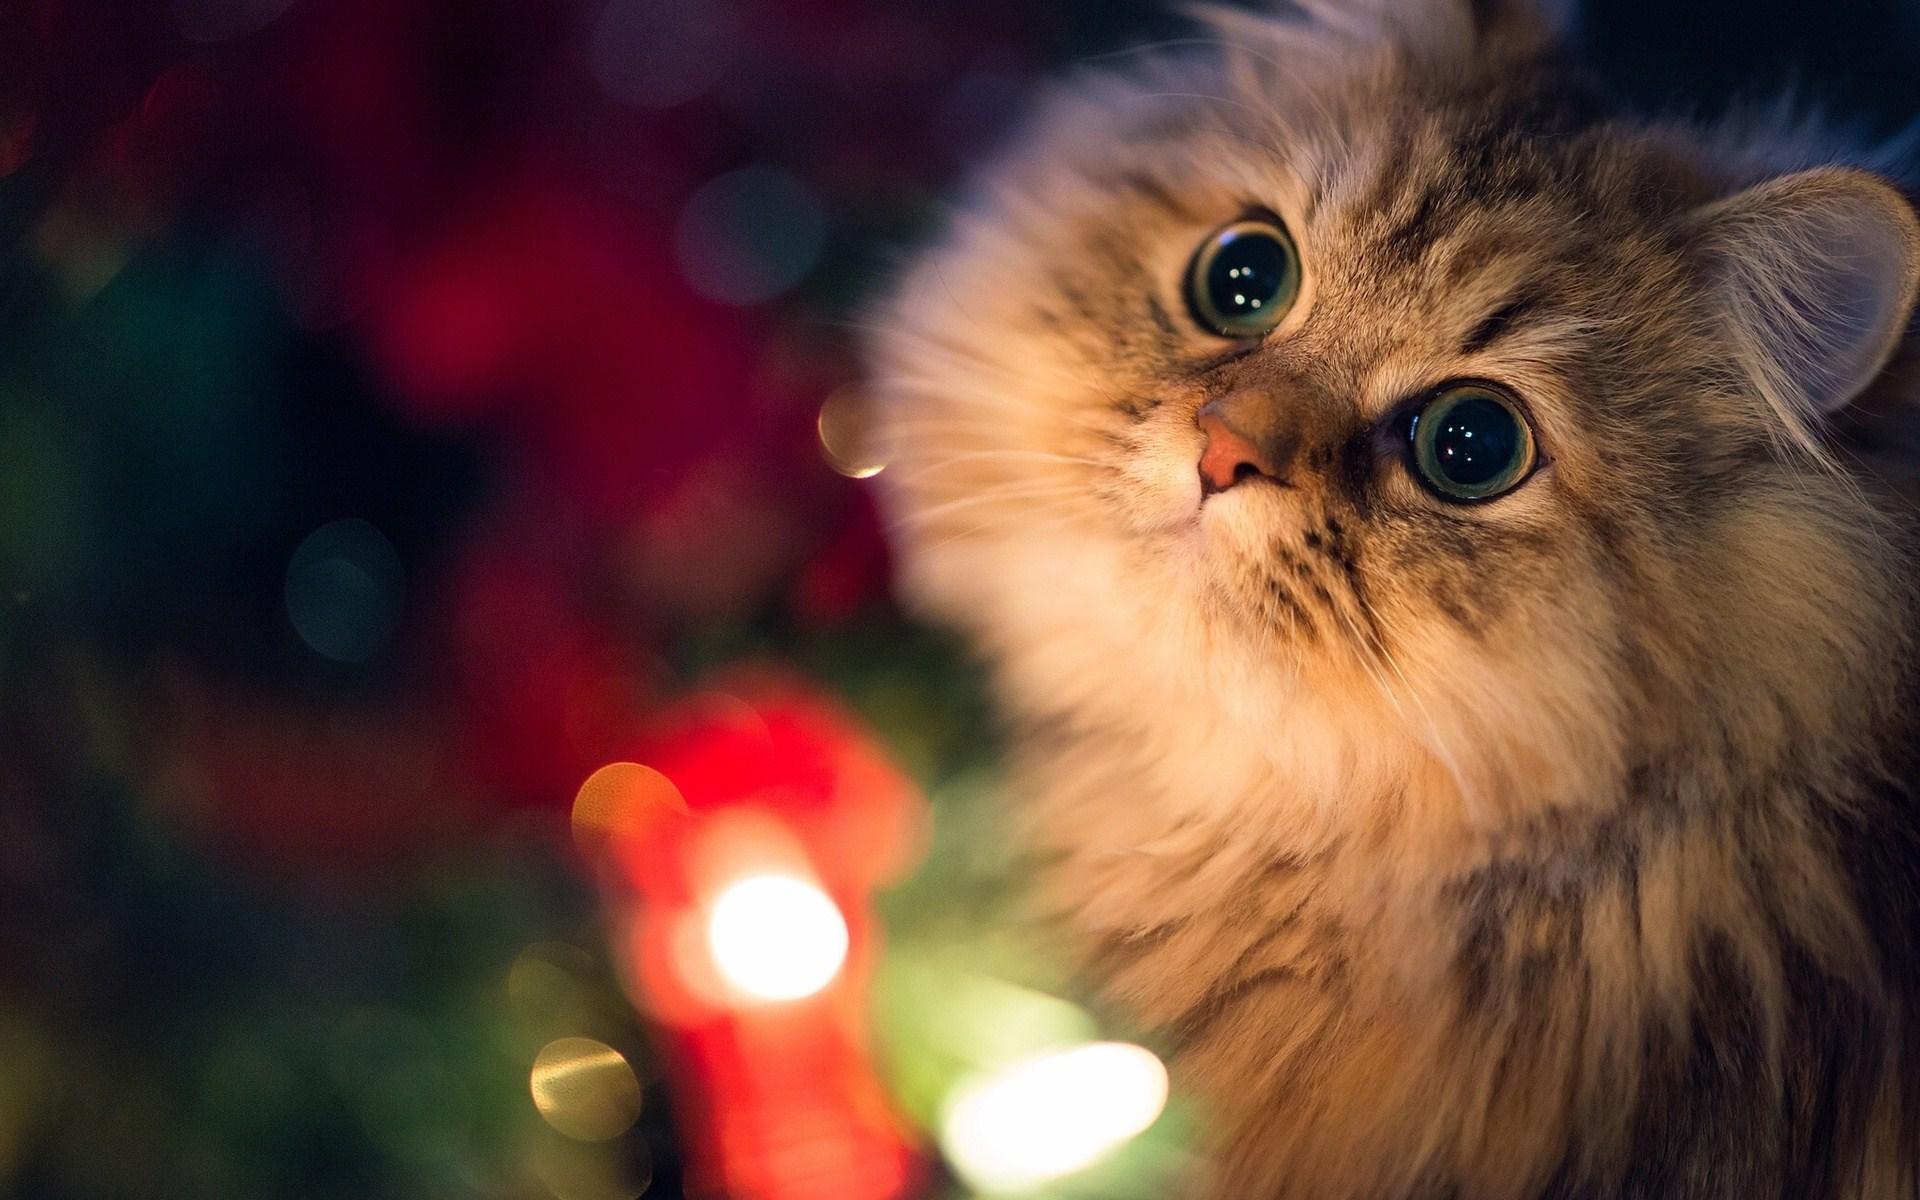 Cat Look Lights Photo HD Wallpaper